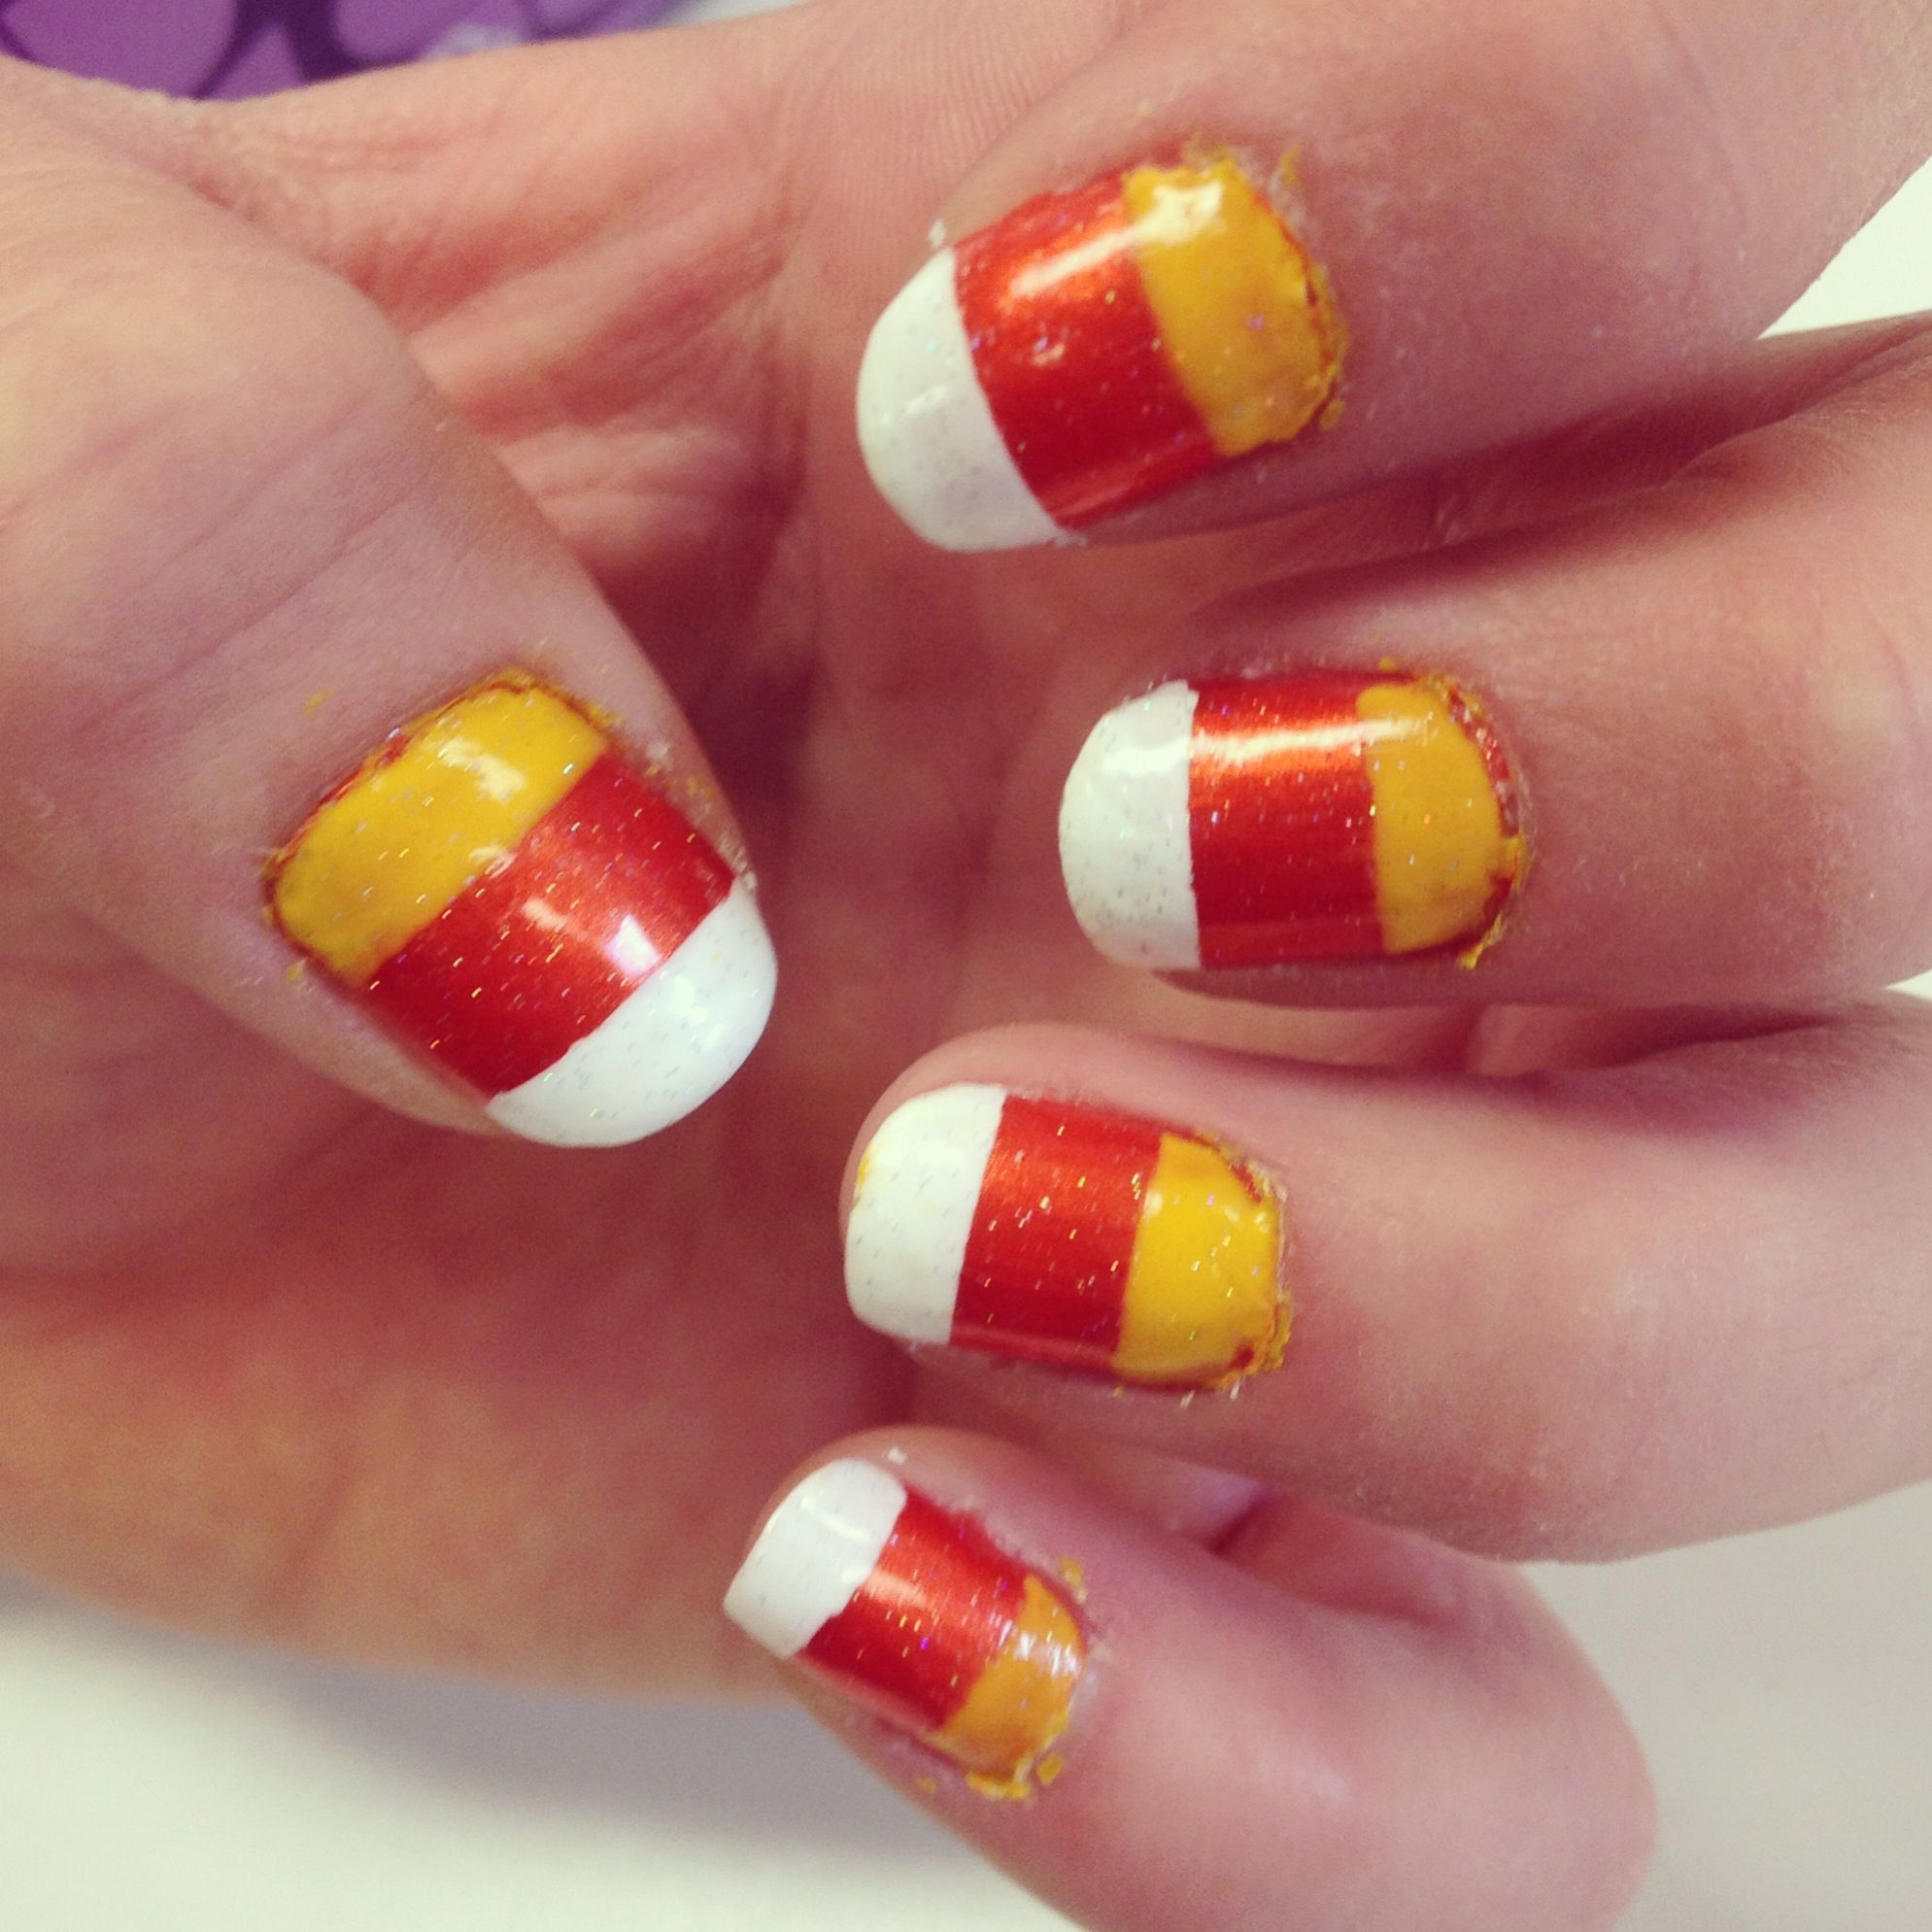 Fantastisch Halloween Nägel Süßigkeiten Mais Ideen - Nagellack-Ideen ...